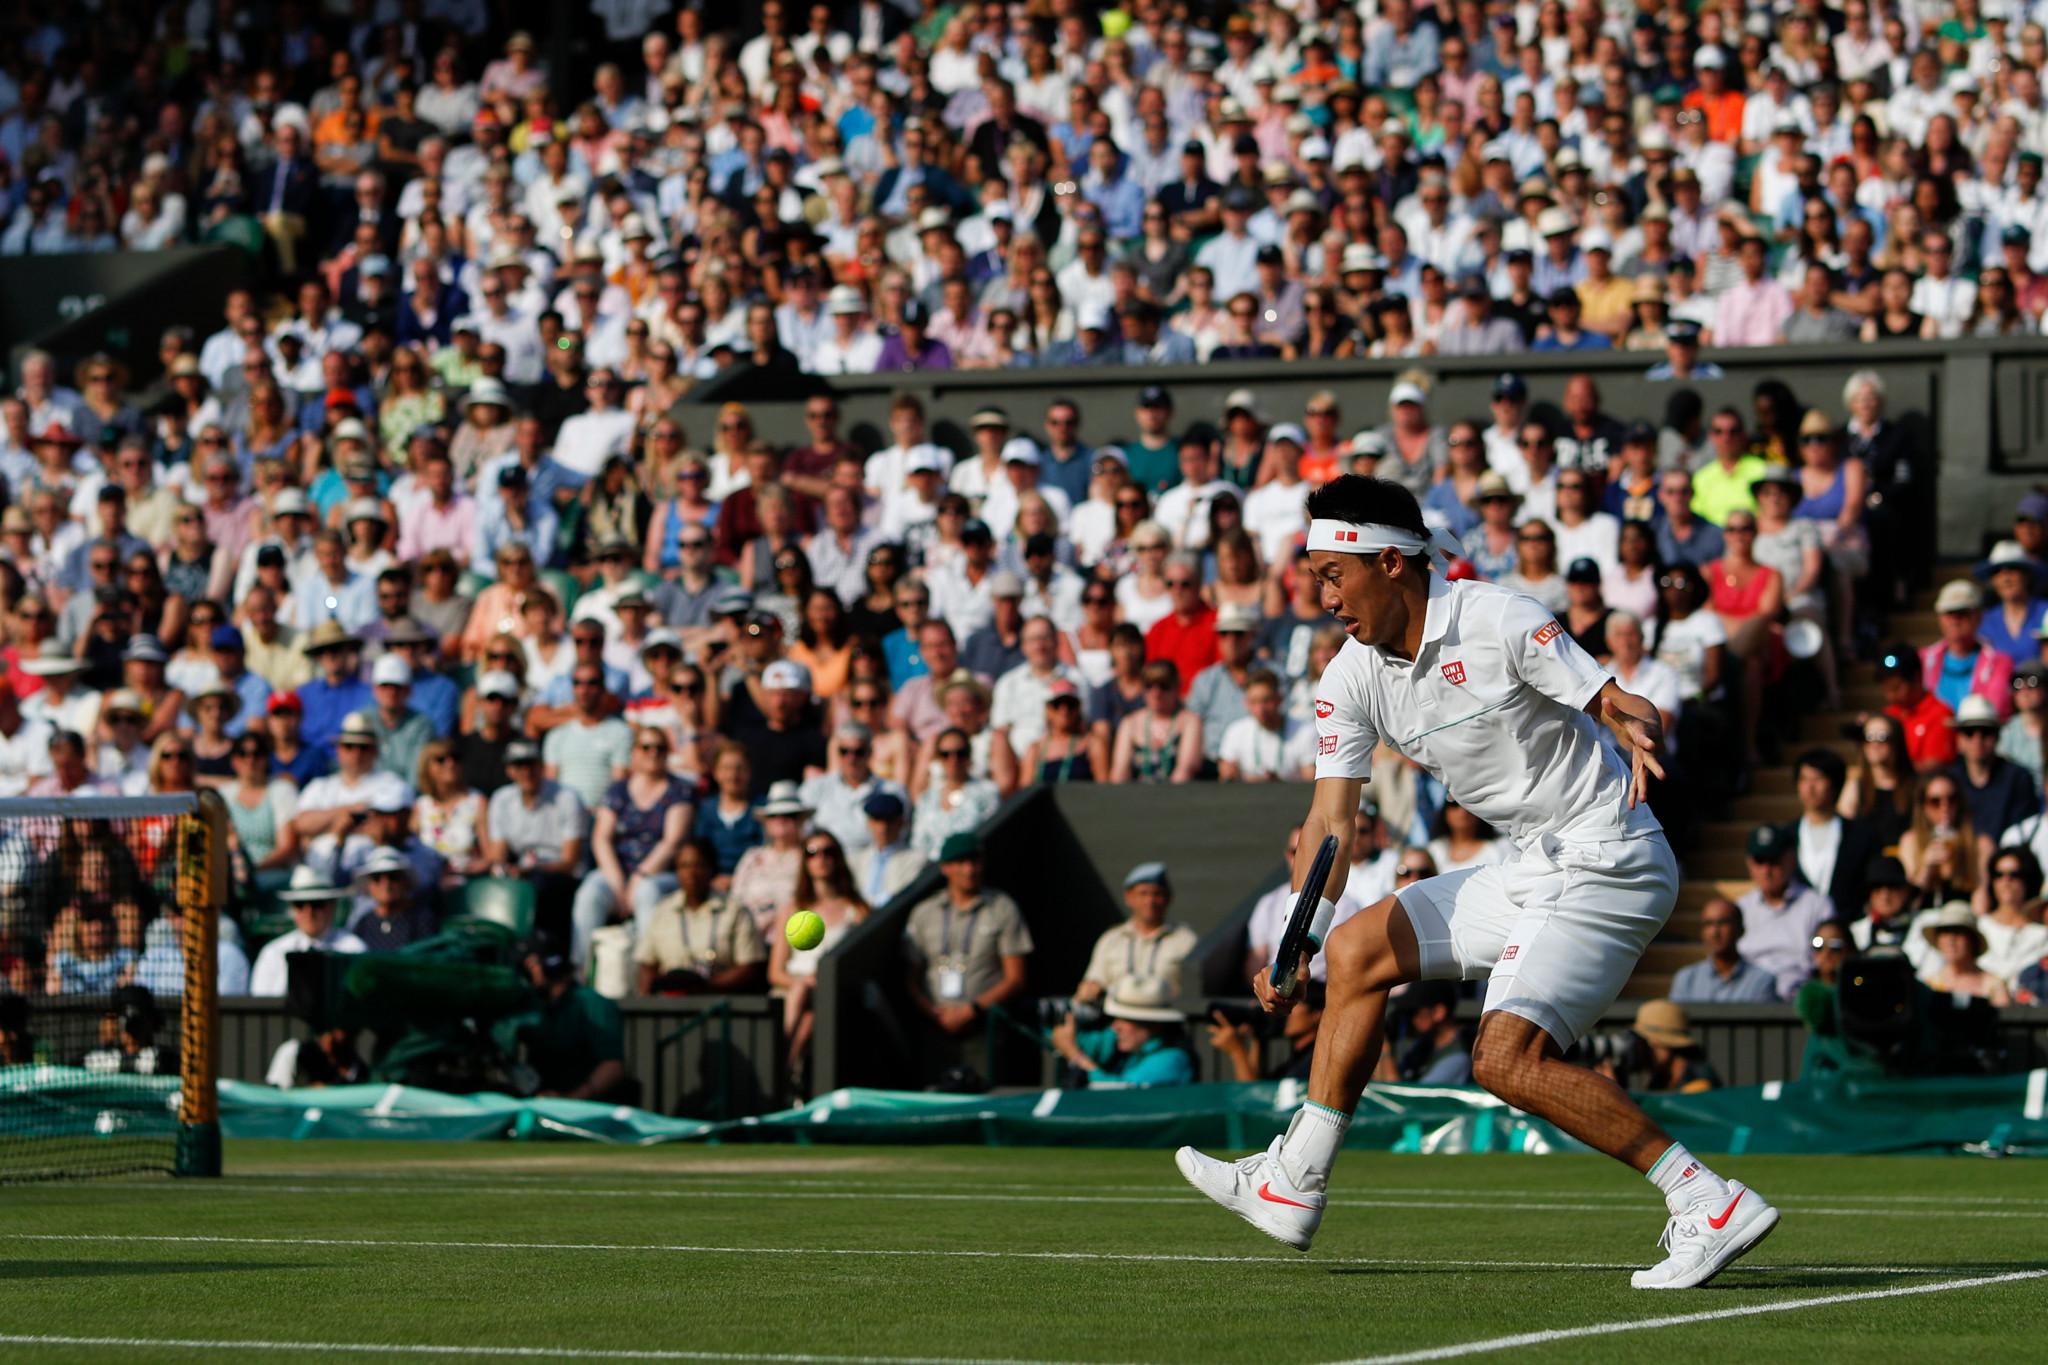 Nishikori eyes second Olympic tennis medal on home ground of Ariake Park